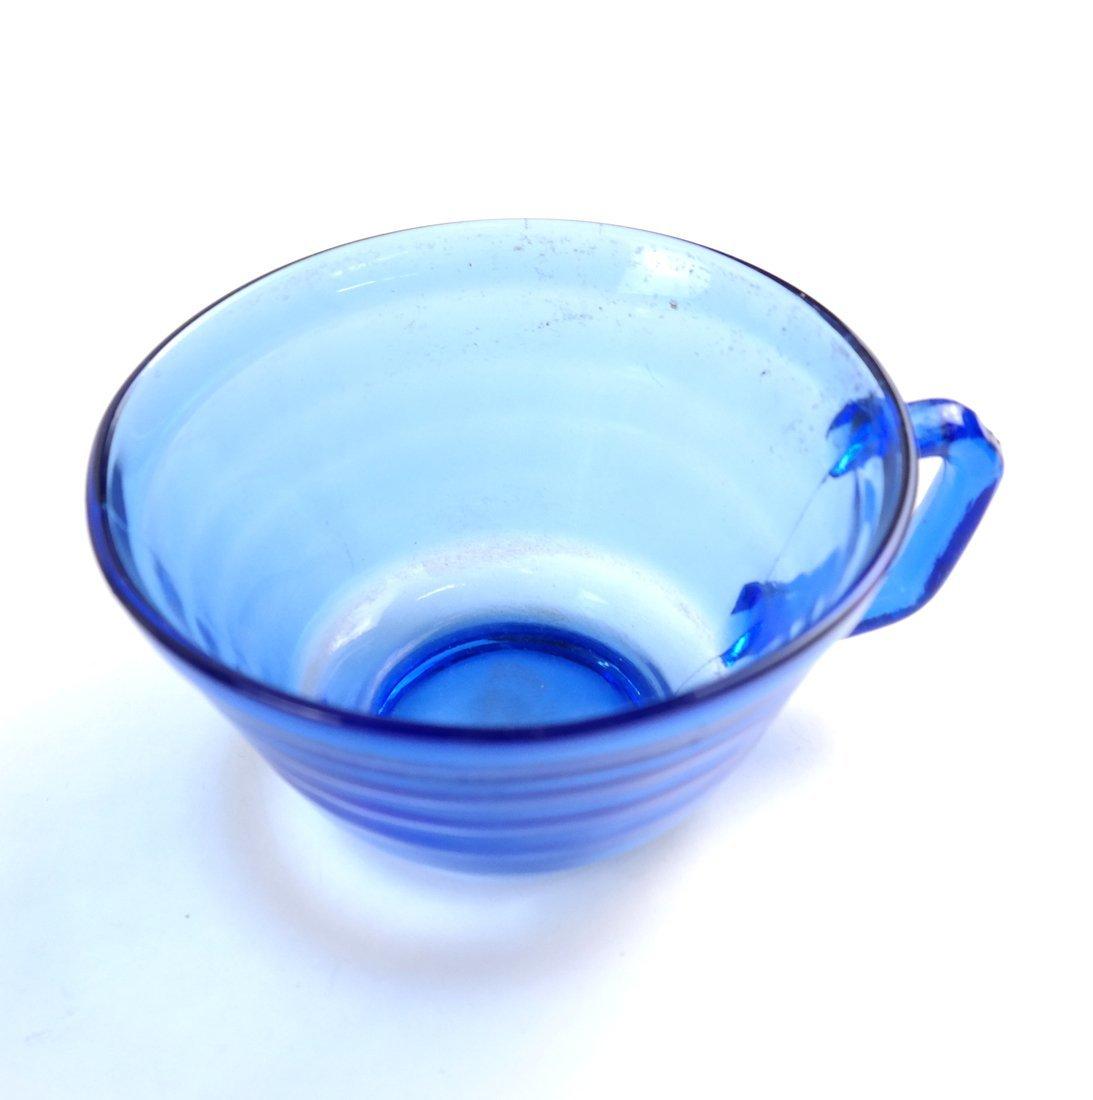 15 Blue Glass Drinking Vessels - 3